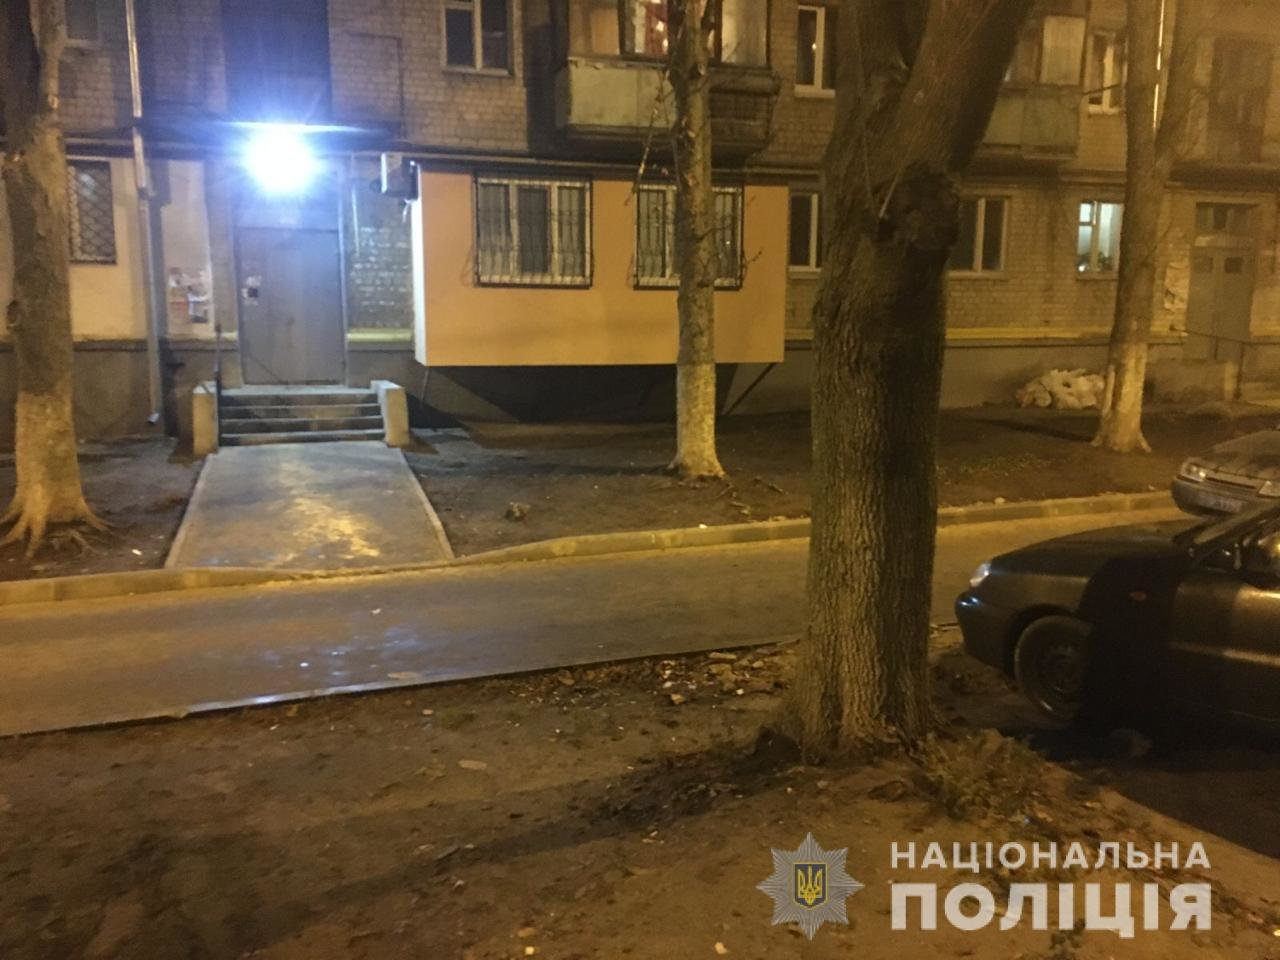 В Харькове женщина едва не убила малознакомого мужчину, - ФОТО, фото-1